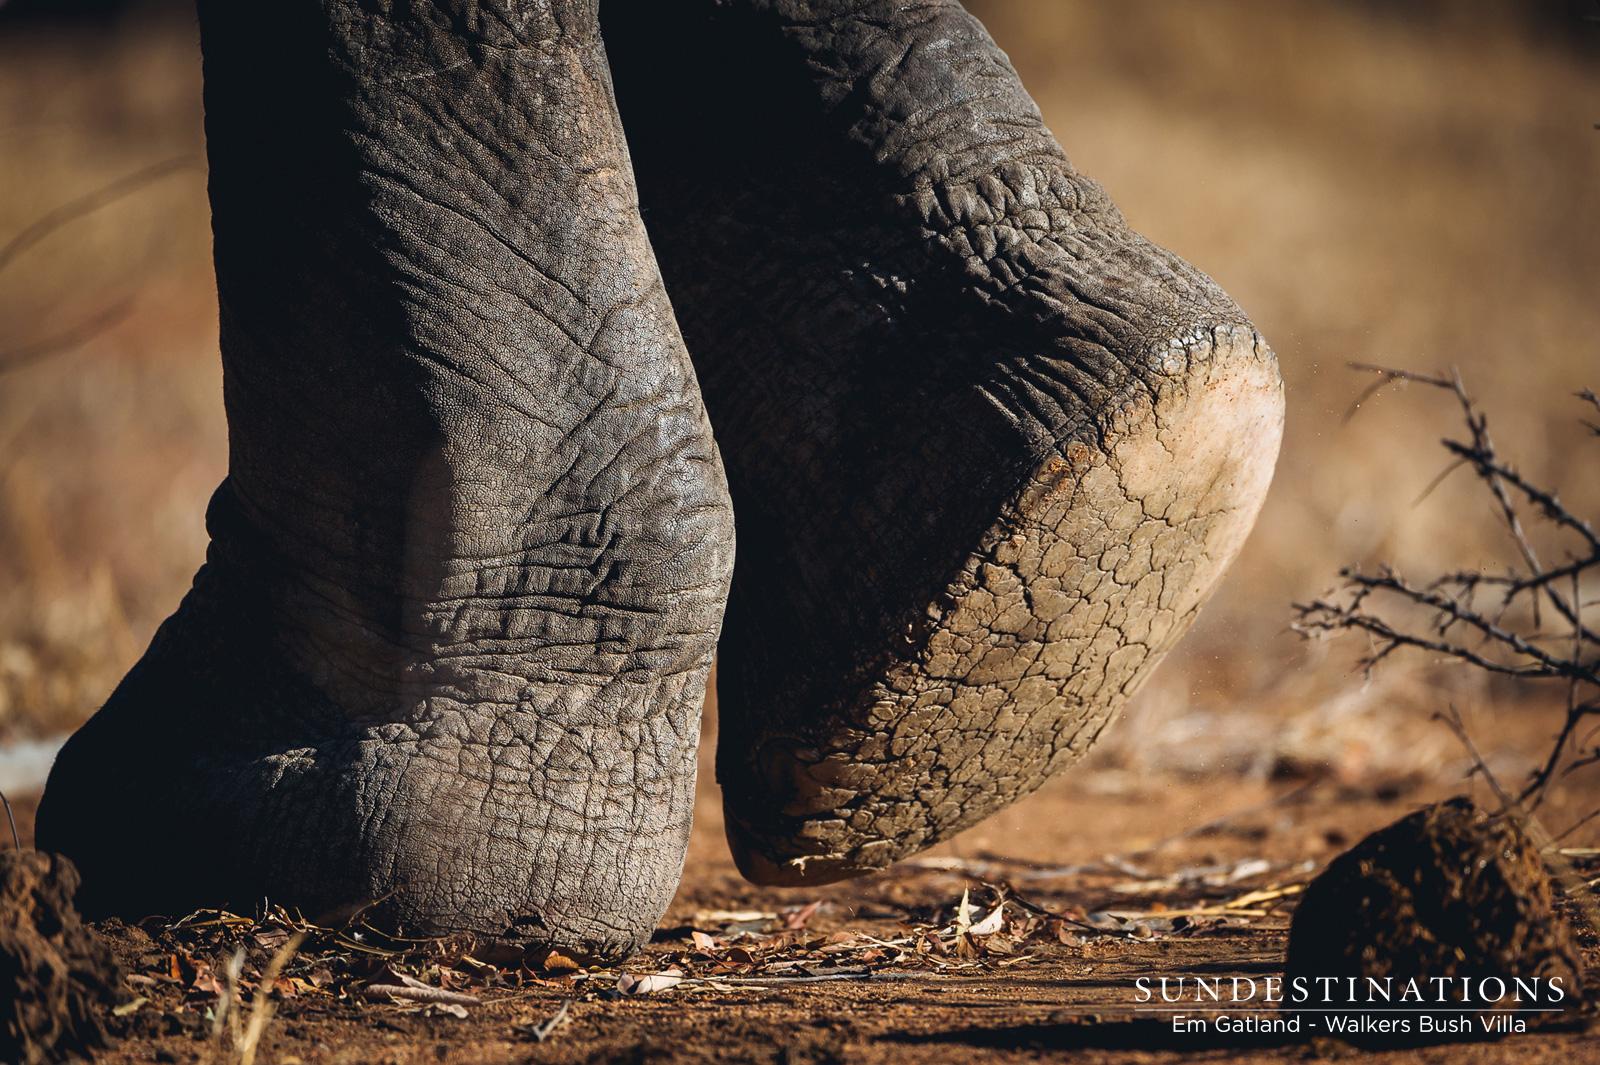 Elephant at Walkers Bush Villa